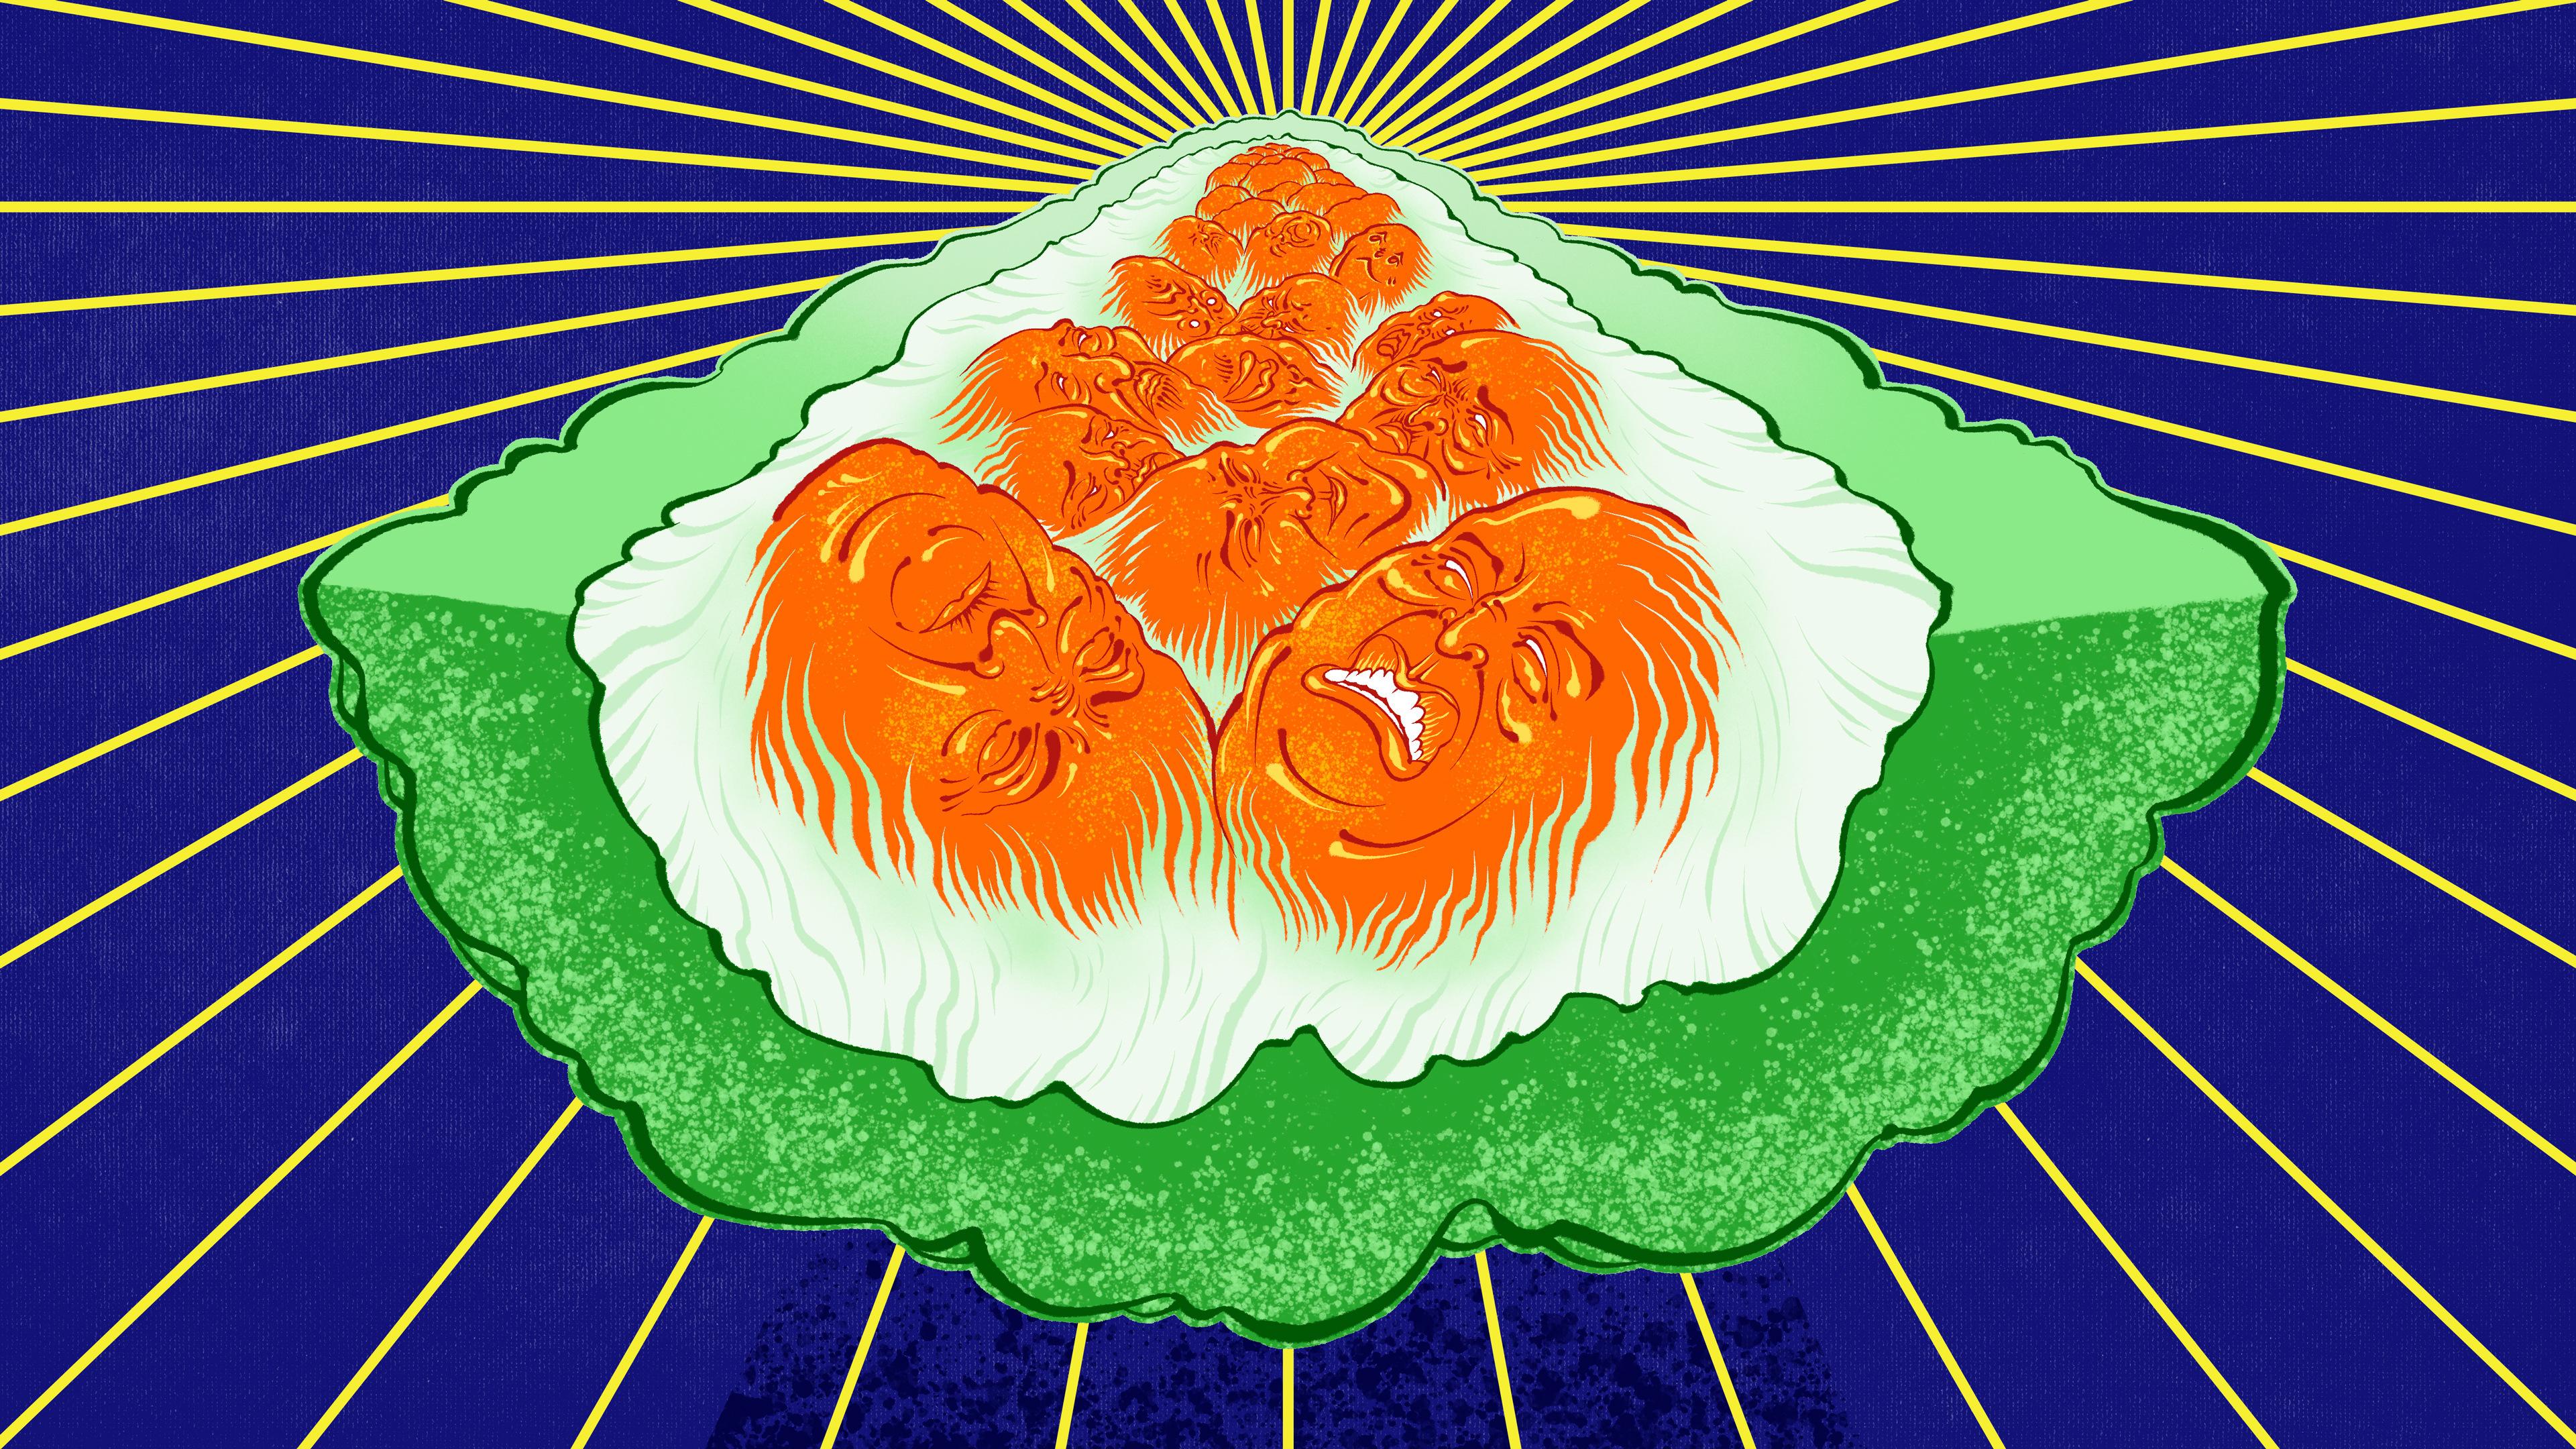 Illustration by Kenn Lam